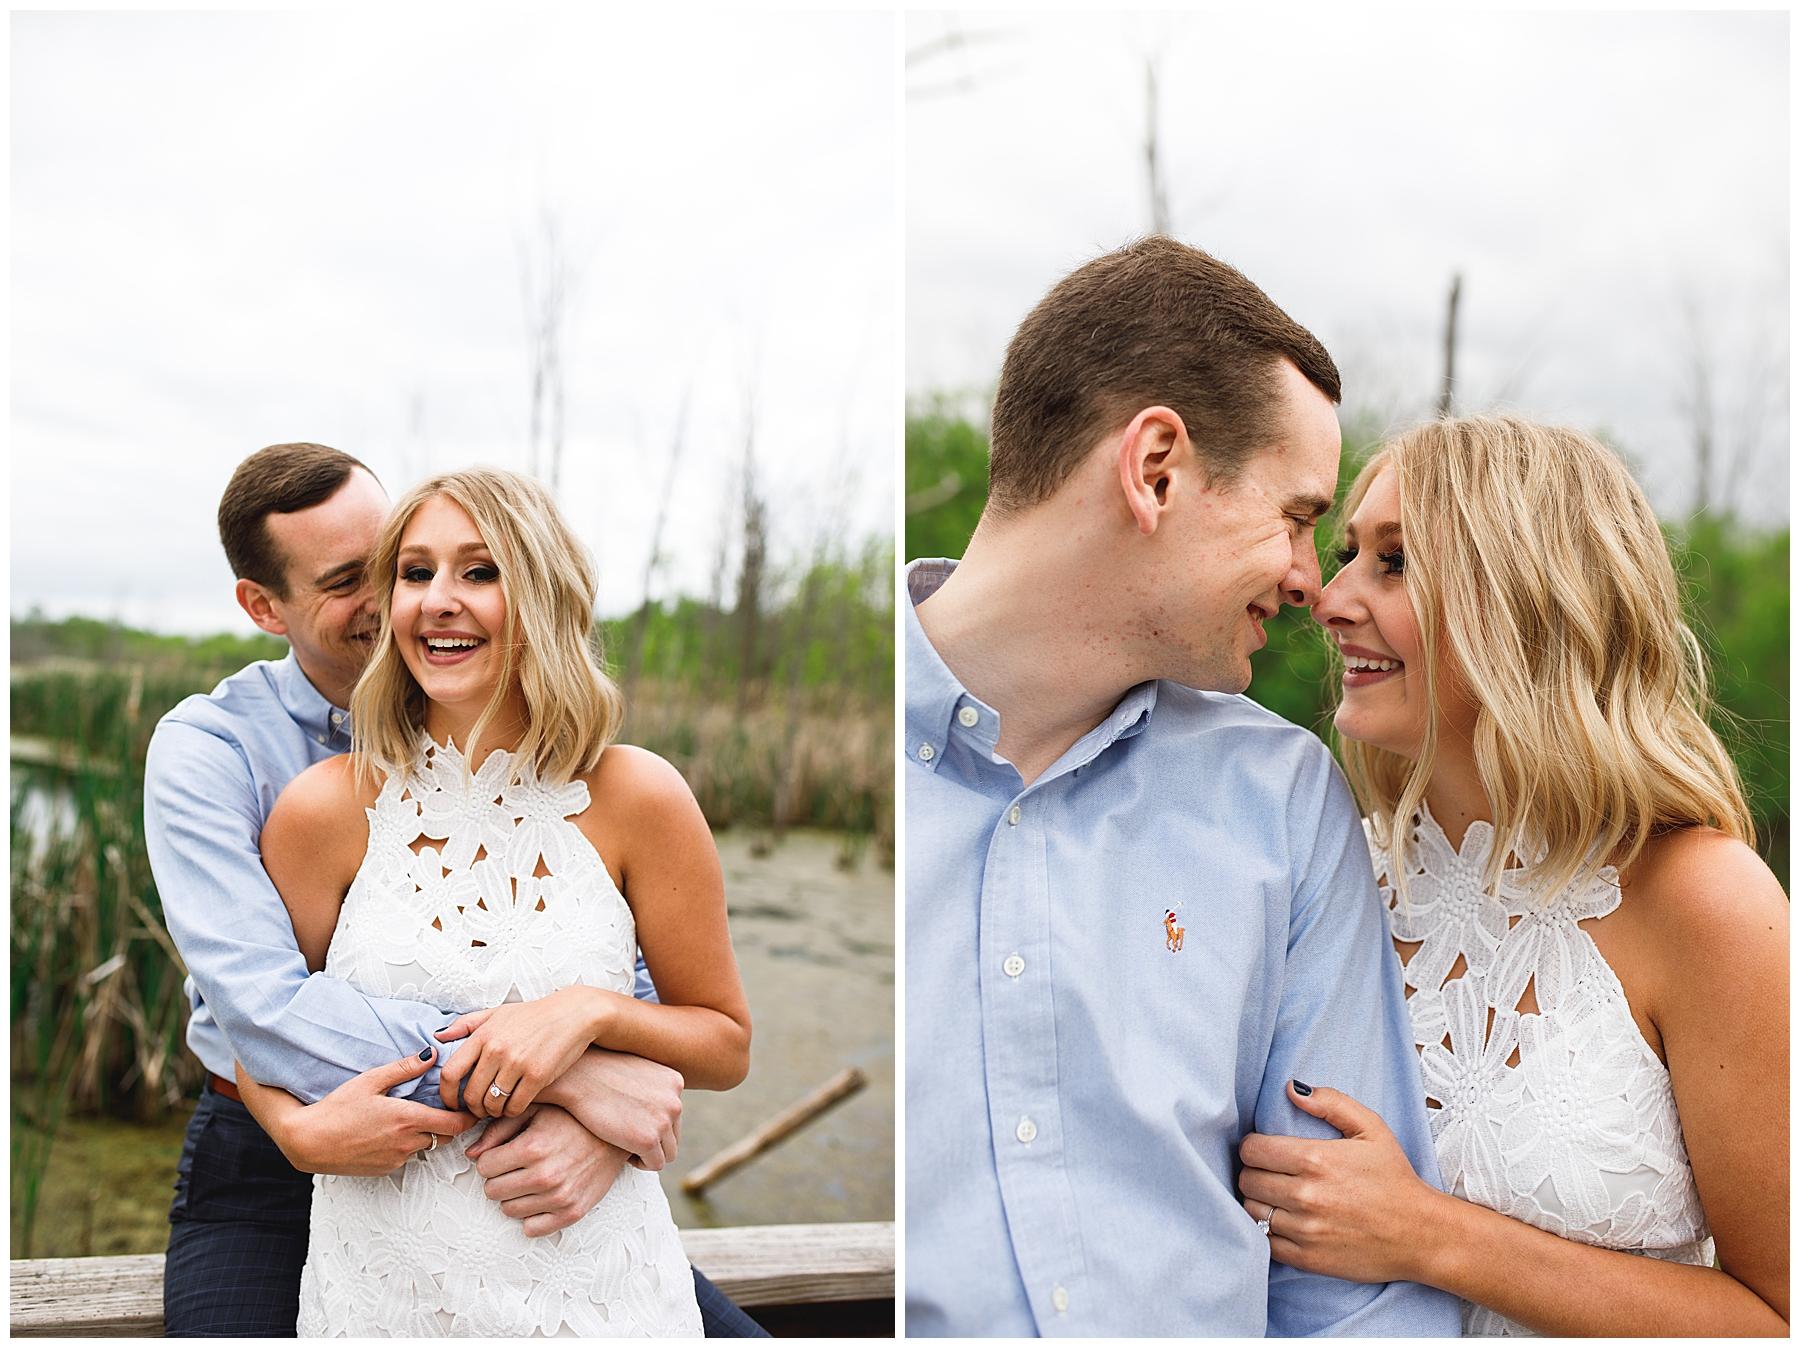 Hannah + Ben Engaged Milwaukee_0004.jpg